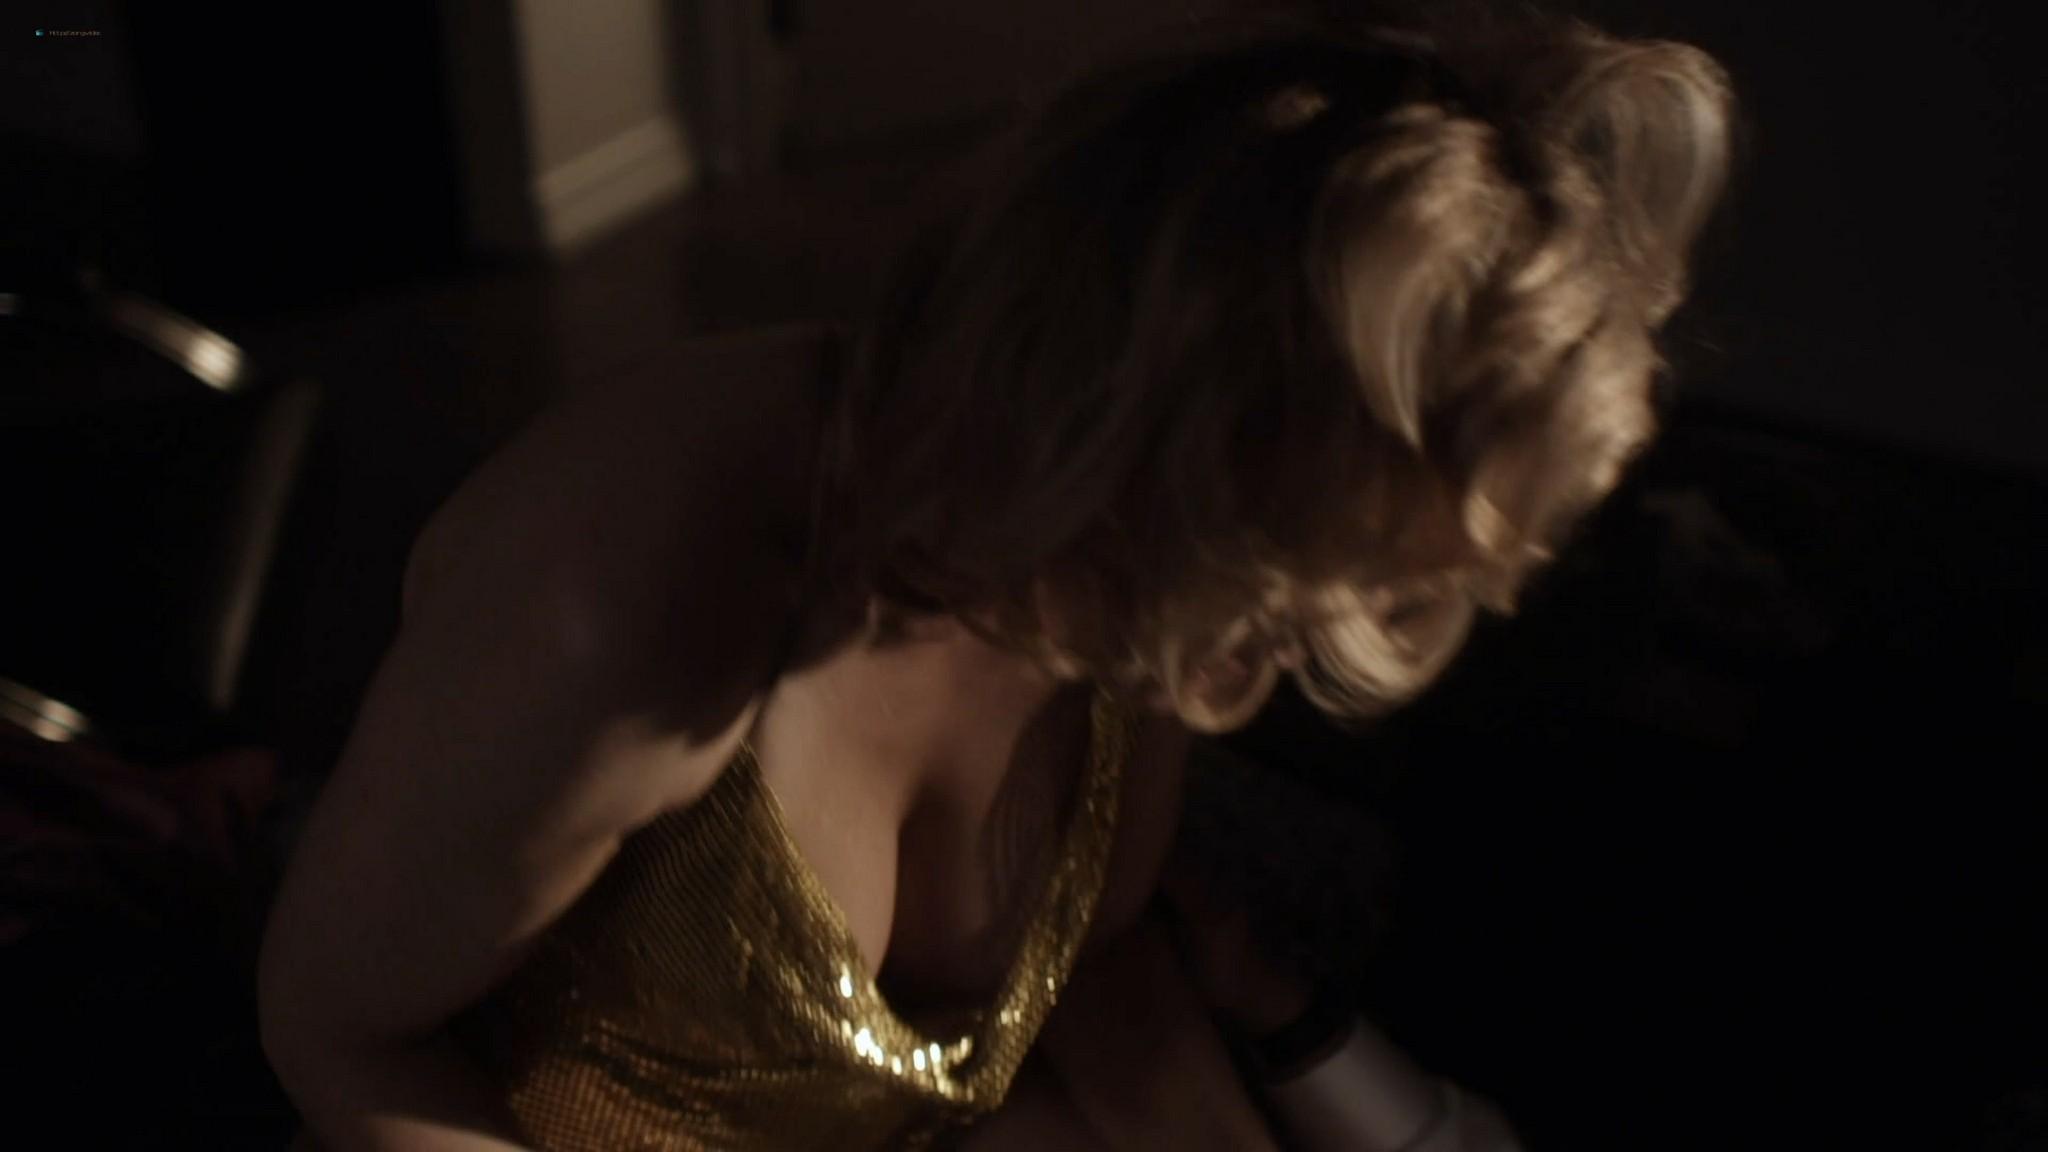 Paloma Guzman hot sex Tatum ONeal nipple slip and some sex Troubled Waters 2020 HD 1080p Web 010